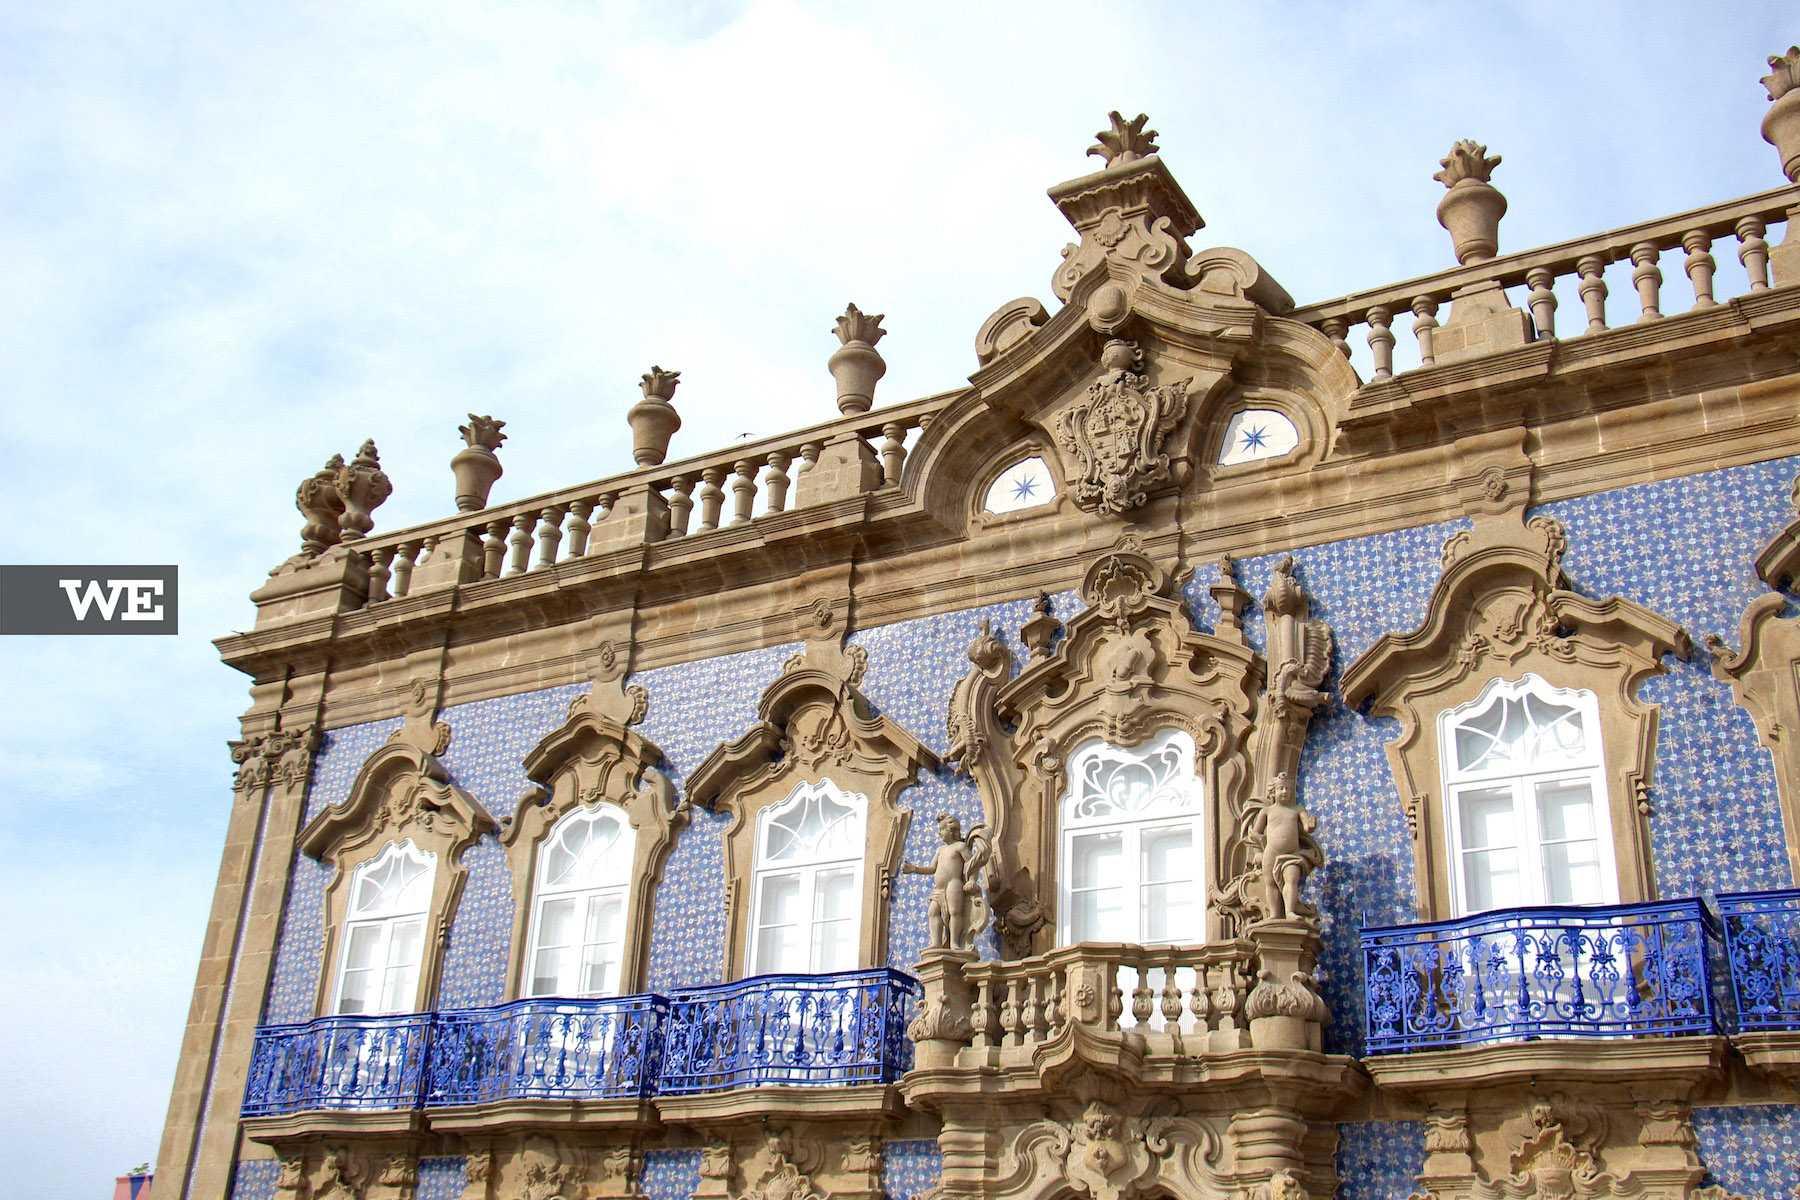 Palácio do Raio de estilo Barroco